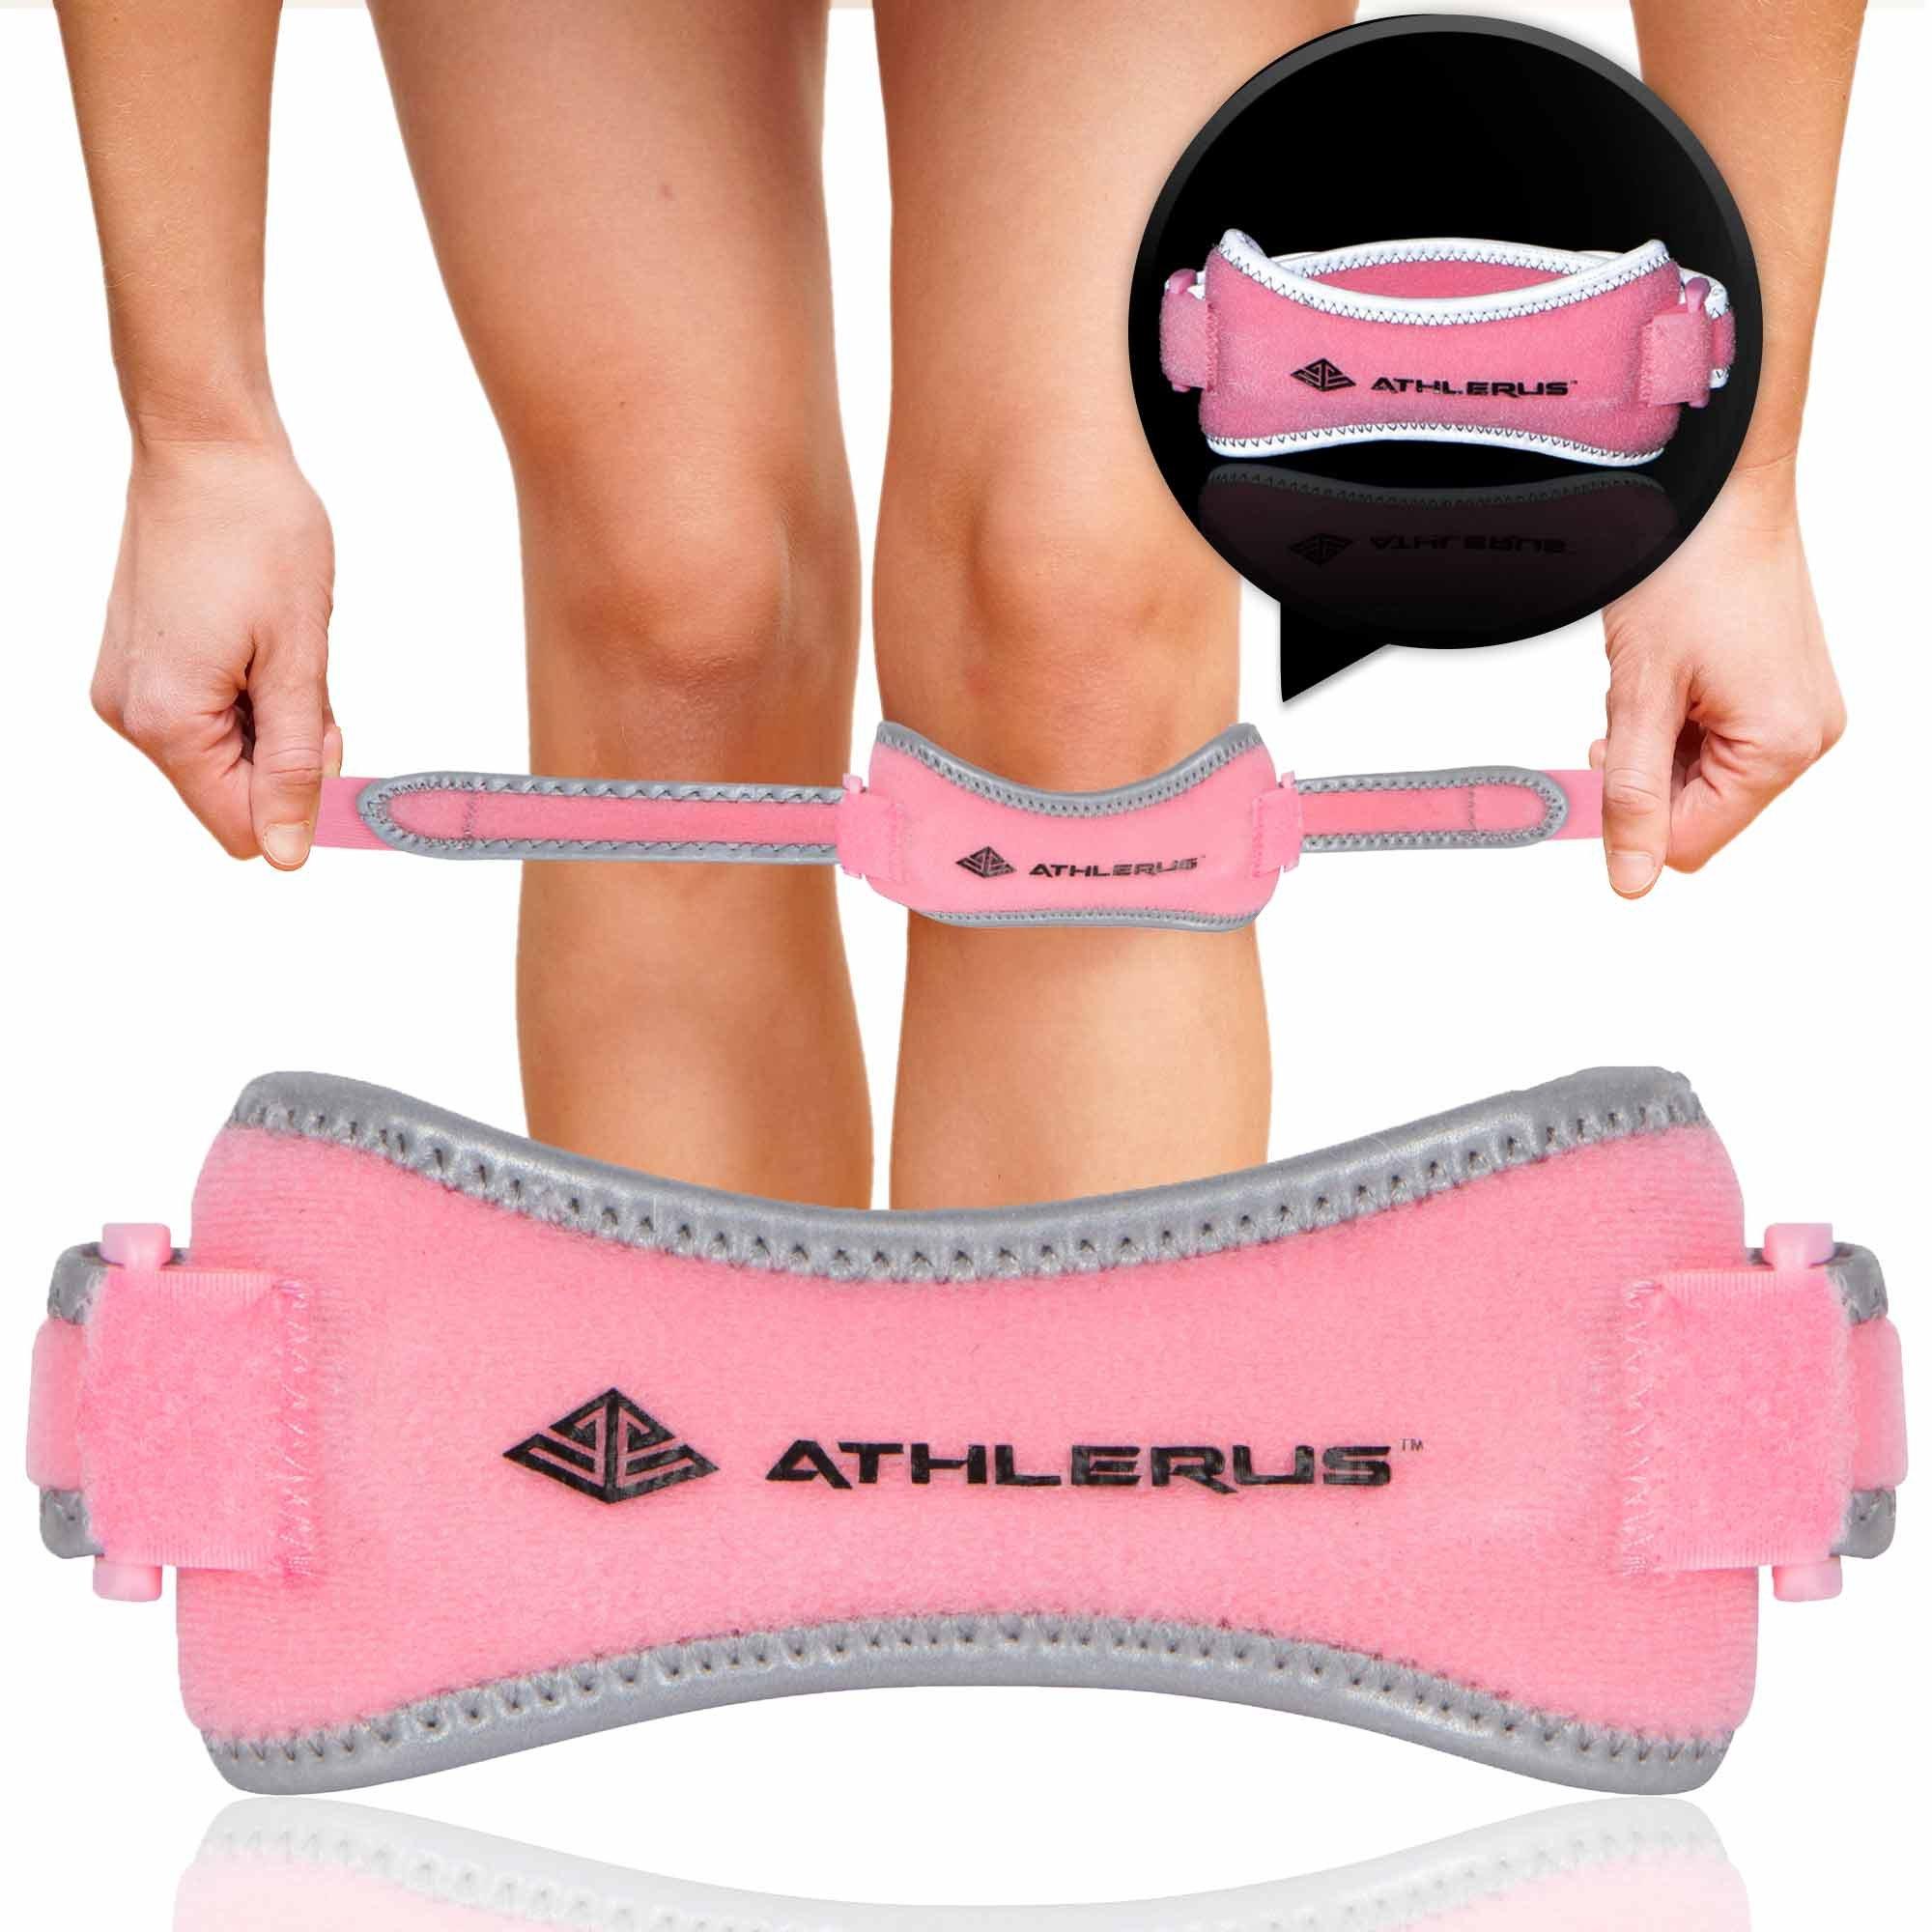 Athlerus Women's Reflective Patella Tendon Support Strap/Knee Pain Relief from Patellar Tendonitis, Runner's Knee, Hiking, Running (1 Piece, Pink)